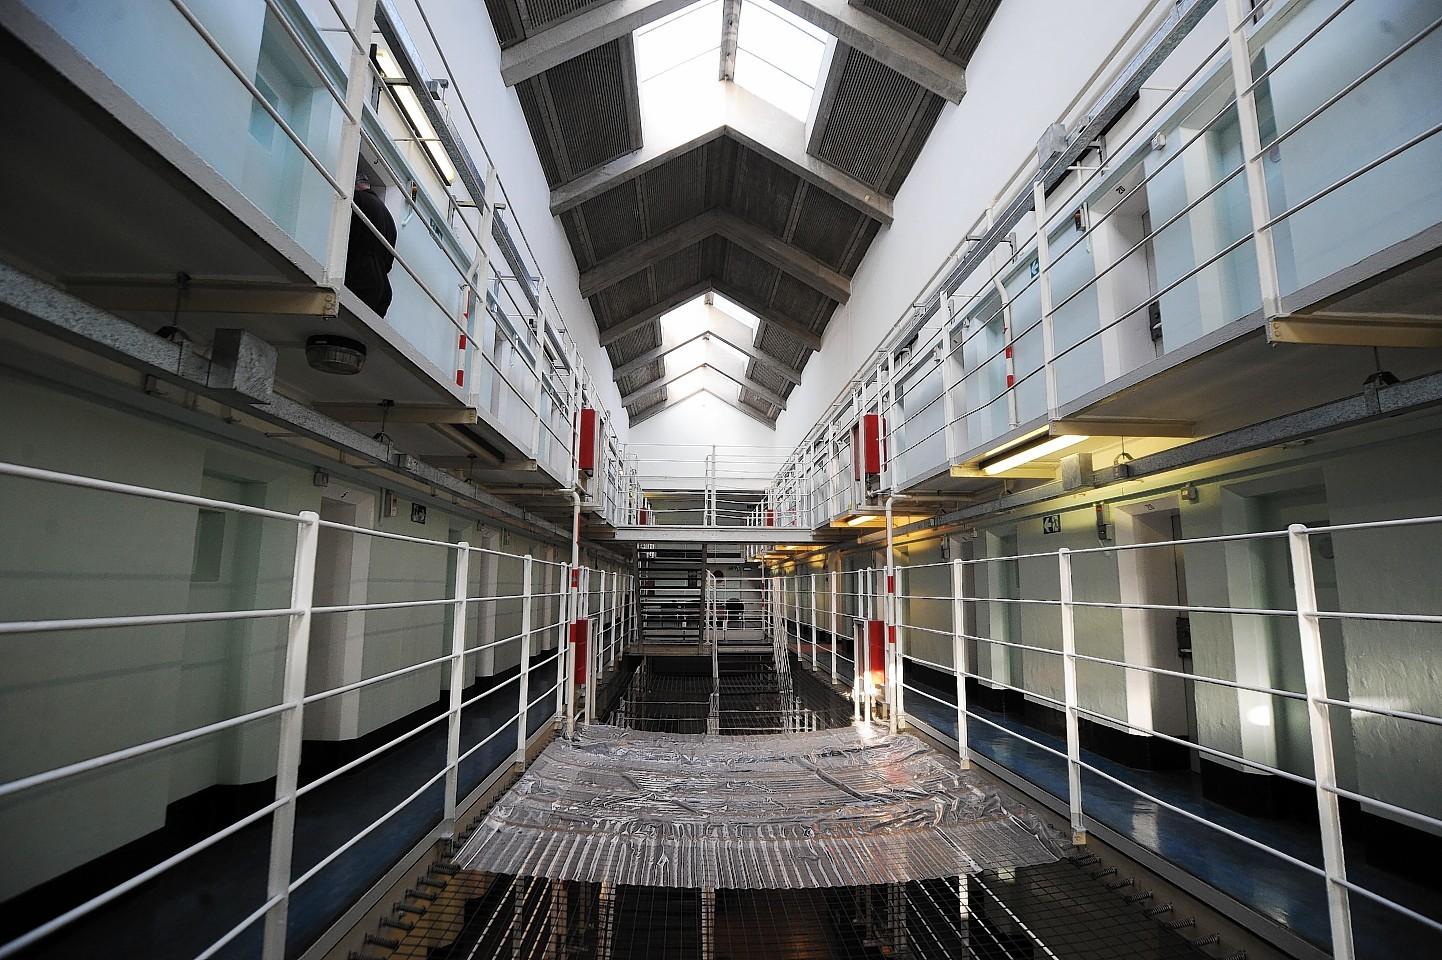 Inside the former Peterhead Prison